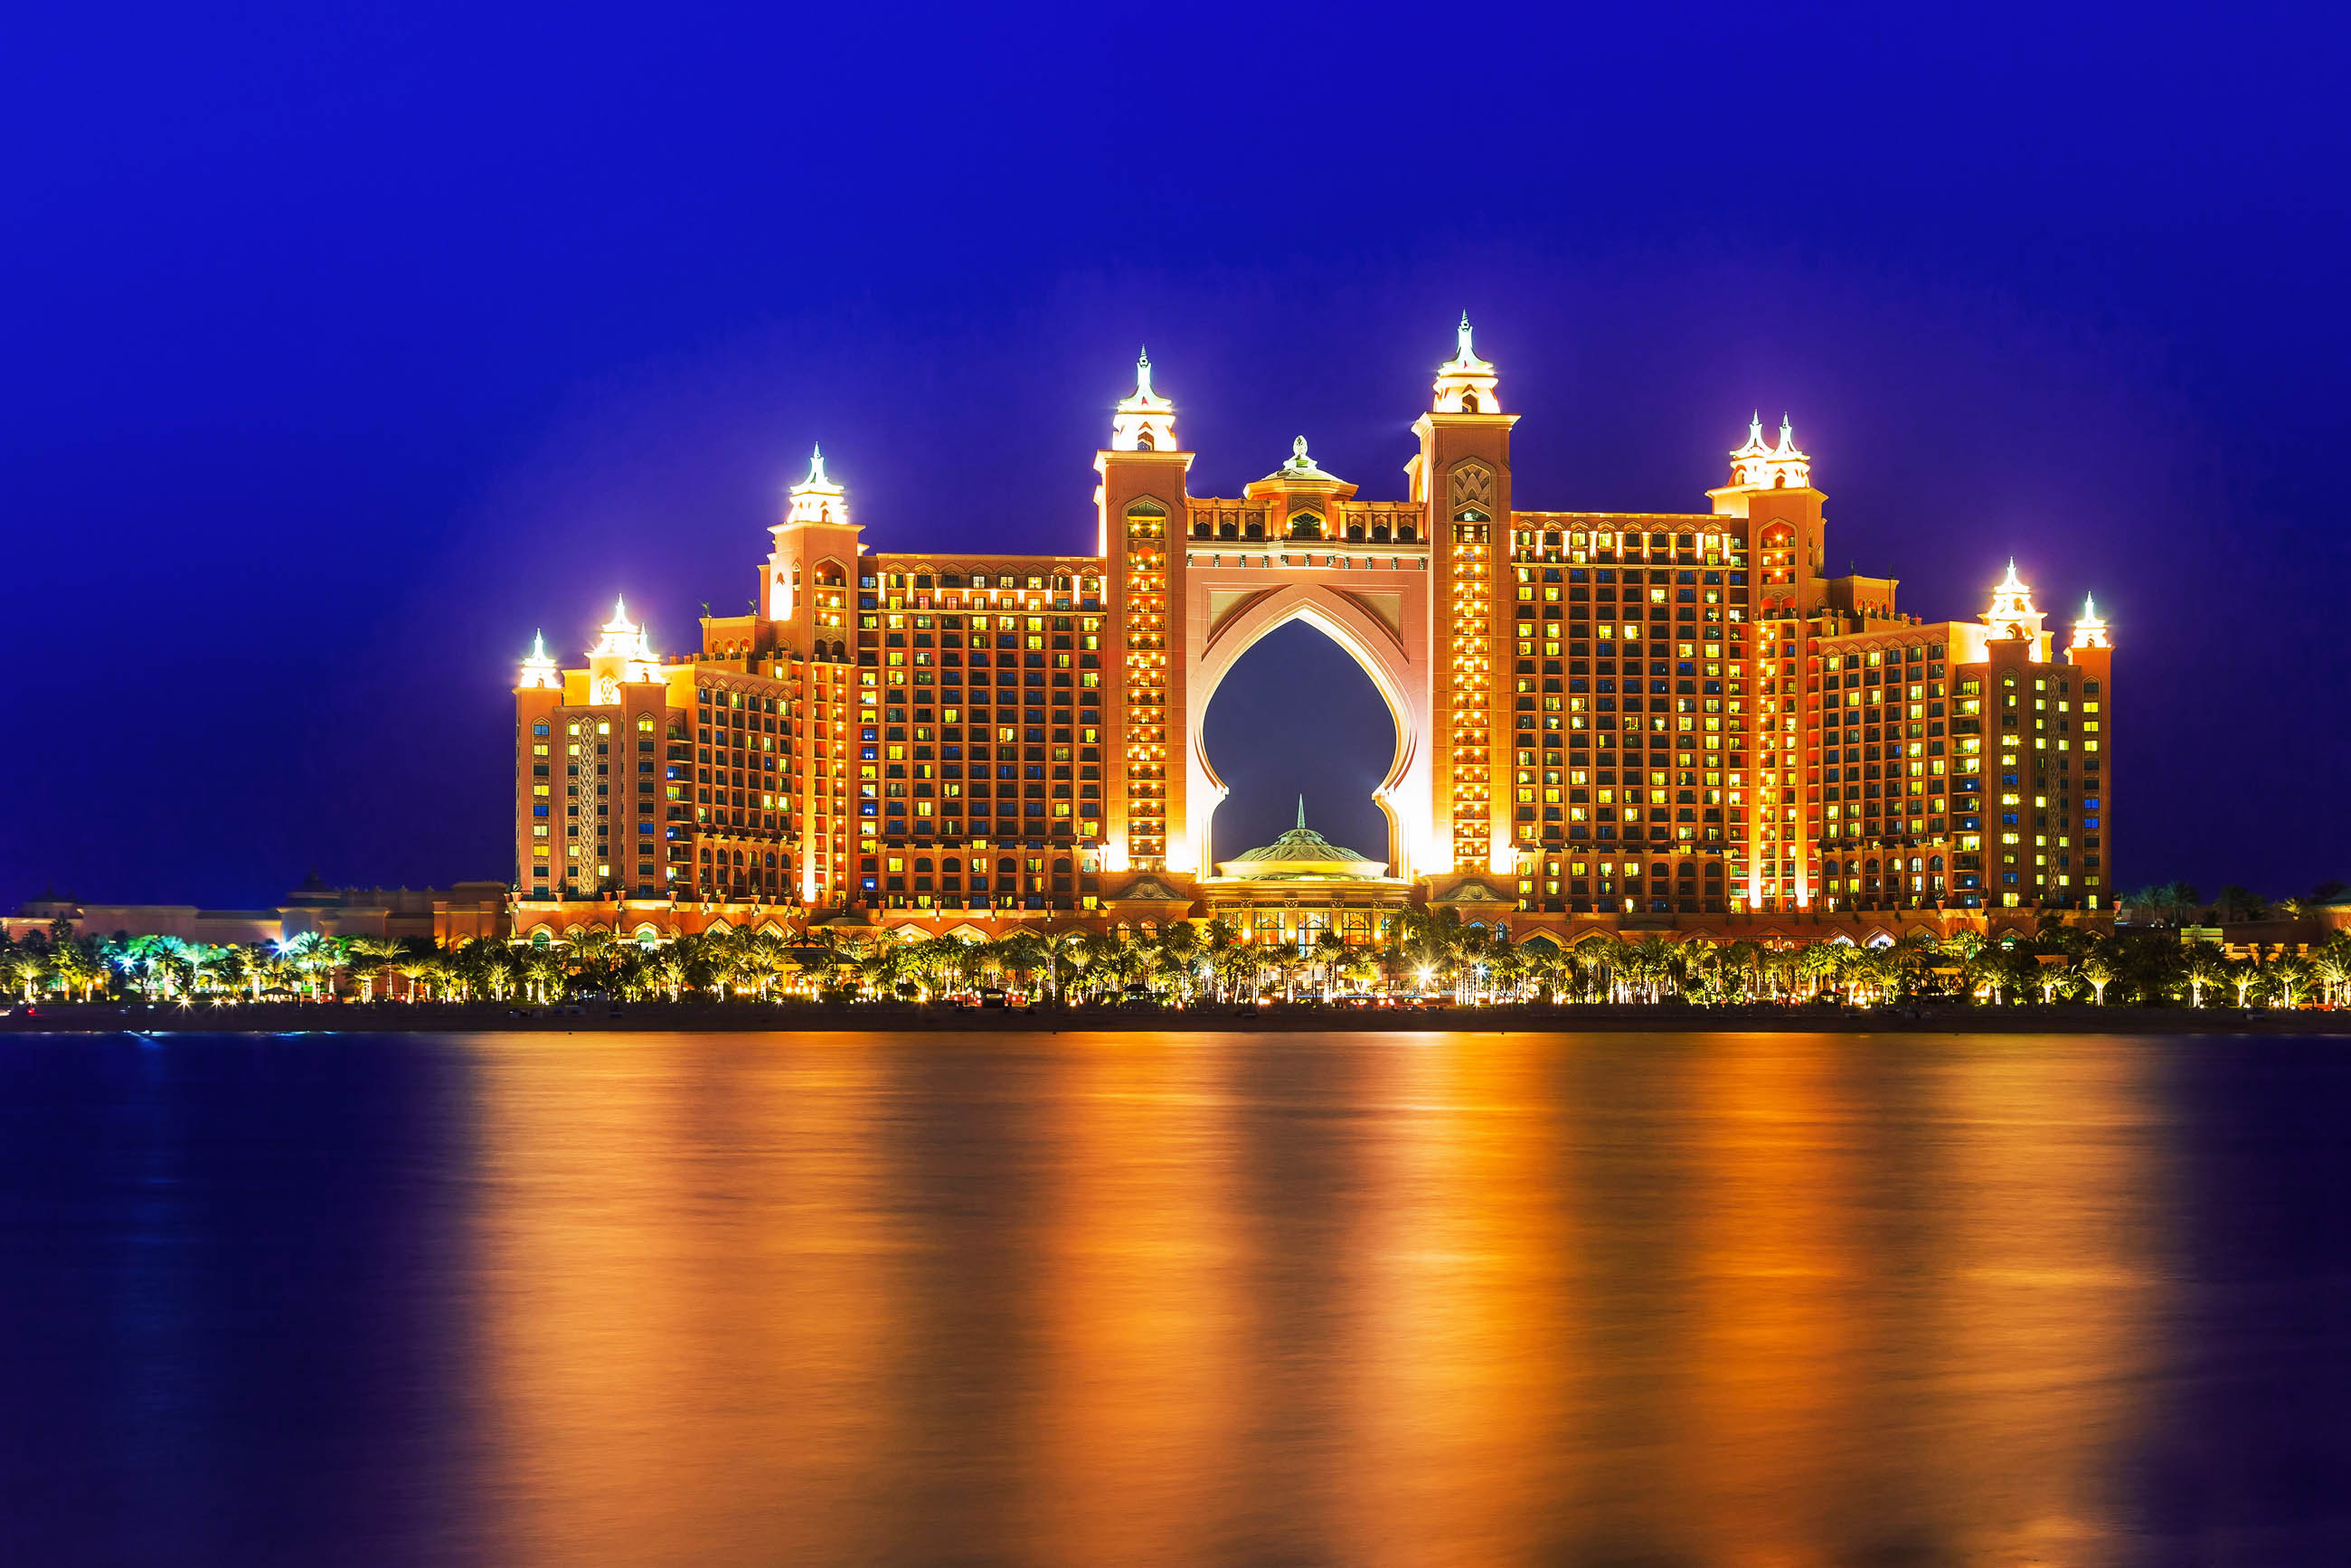 hotel atlantis auf jumeirah in dubai vae vereinigte arabische emirate franks travelbox. Black Bedroom Furniture Sets. Home Design Ideas